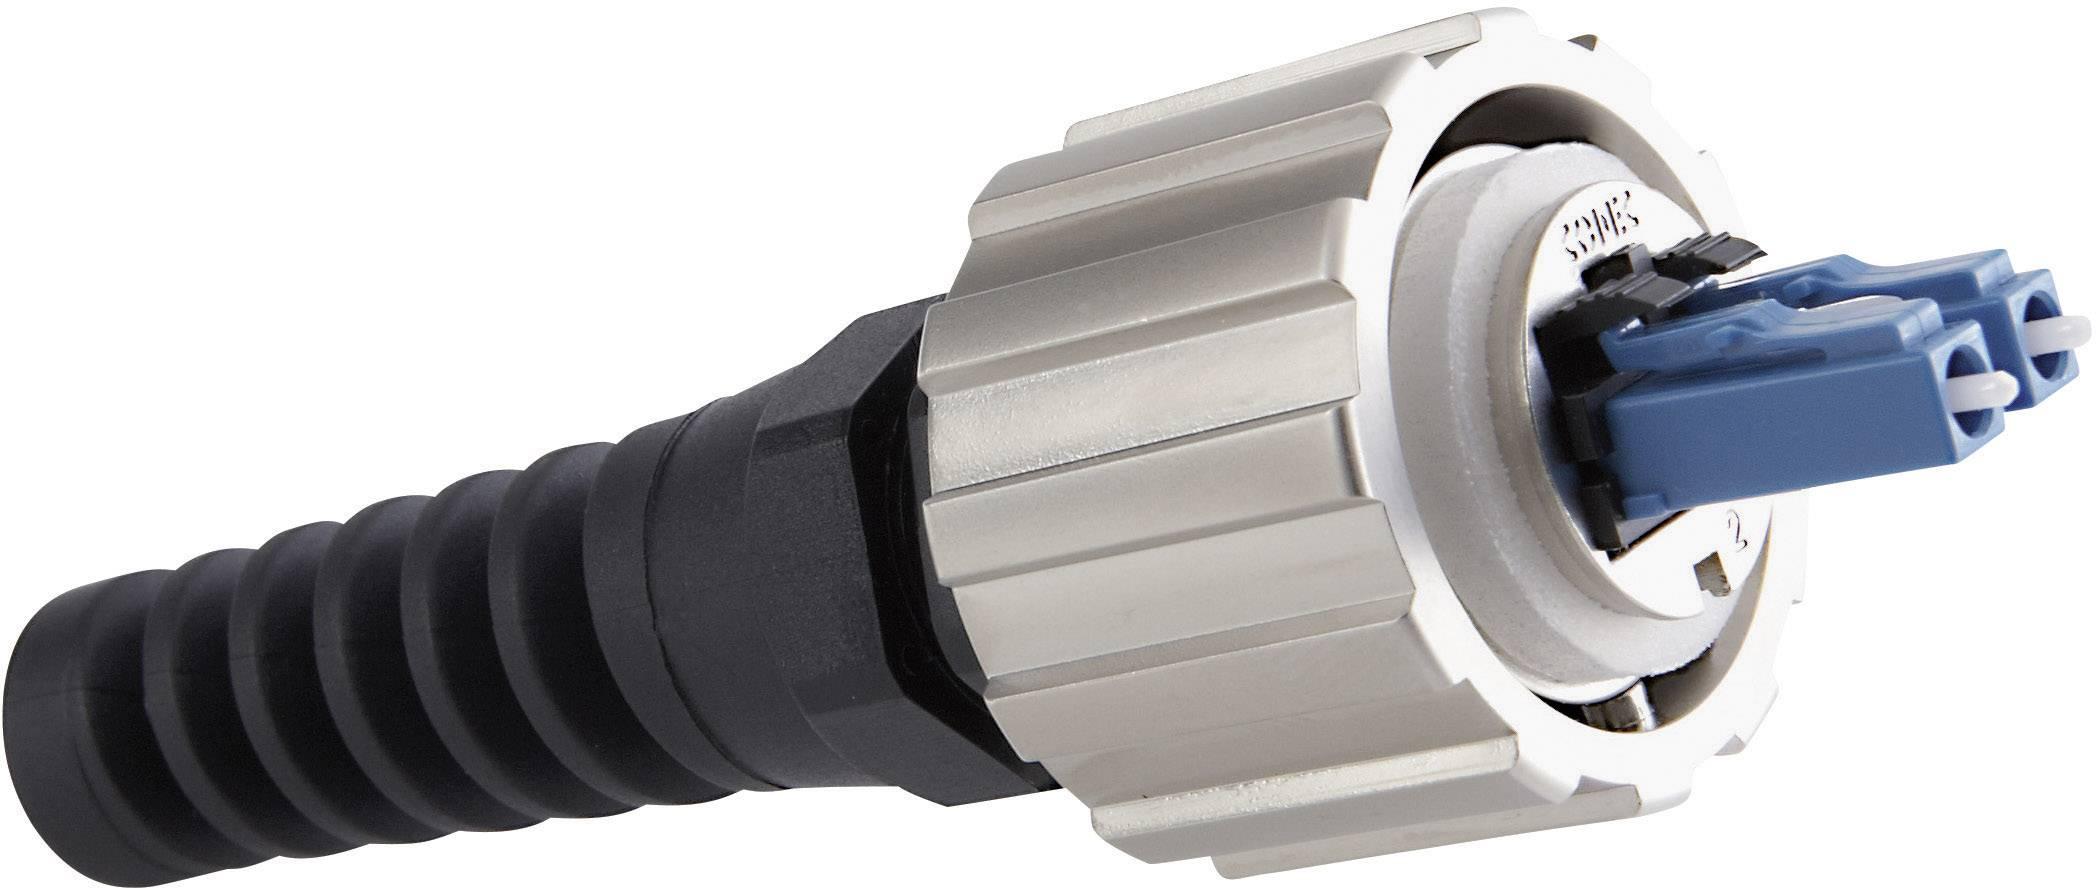 Konektor optických vláken IP67 Conec, 17-300410